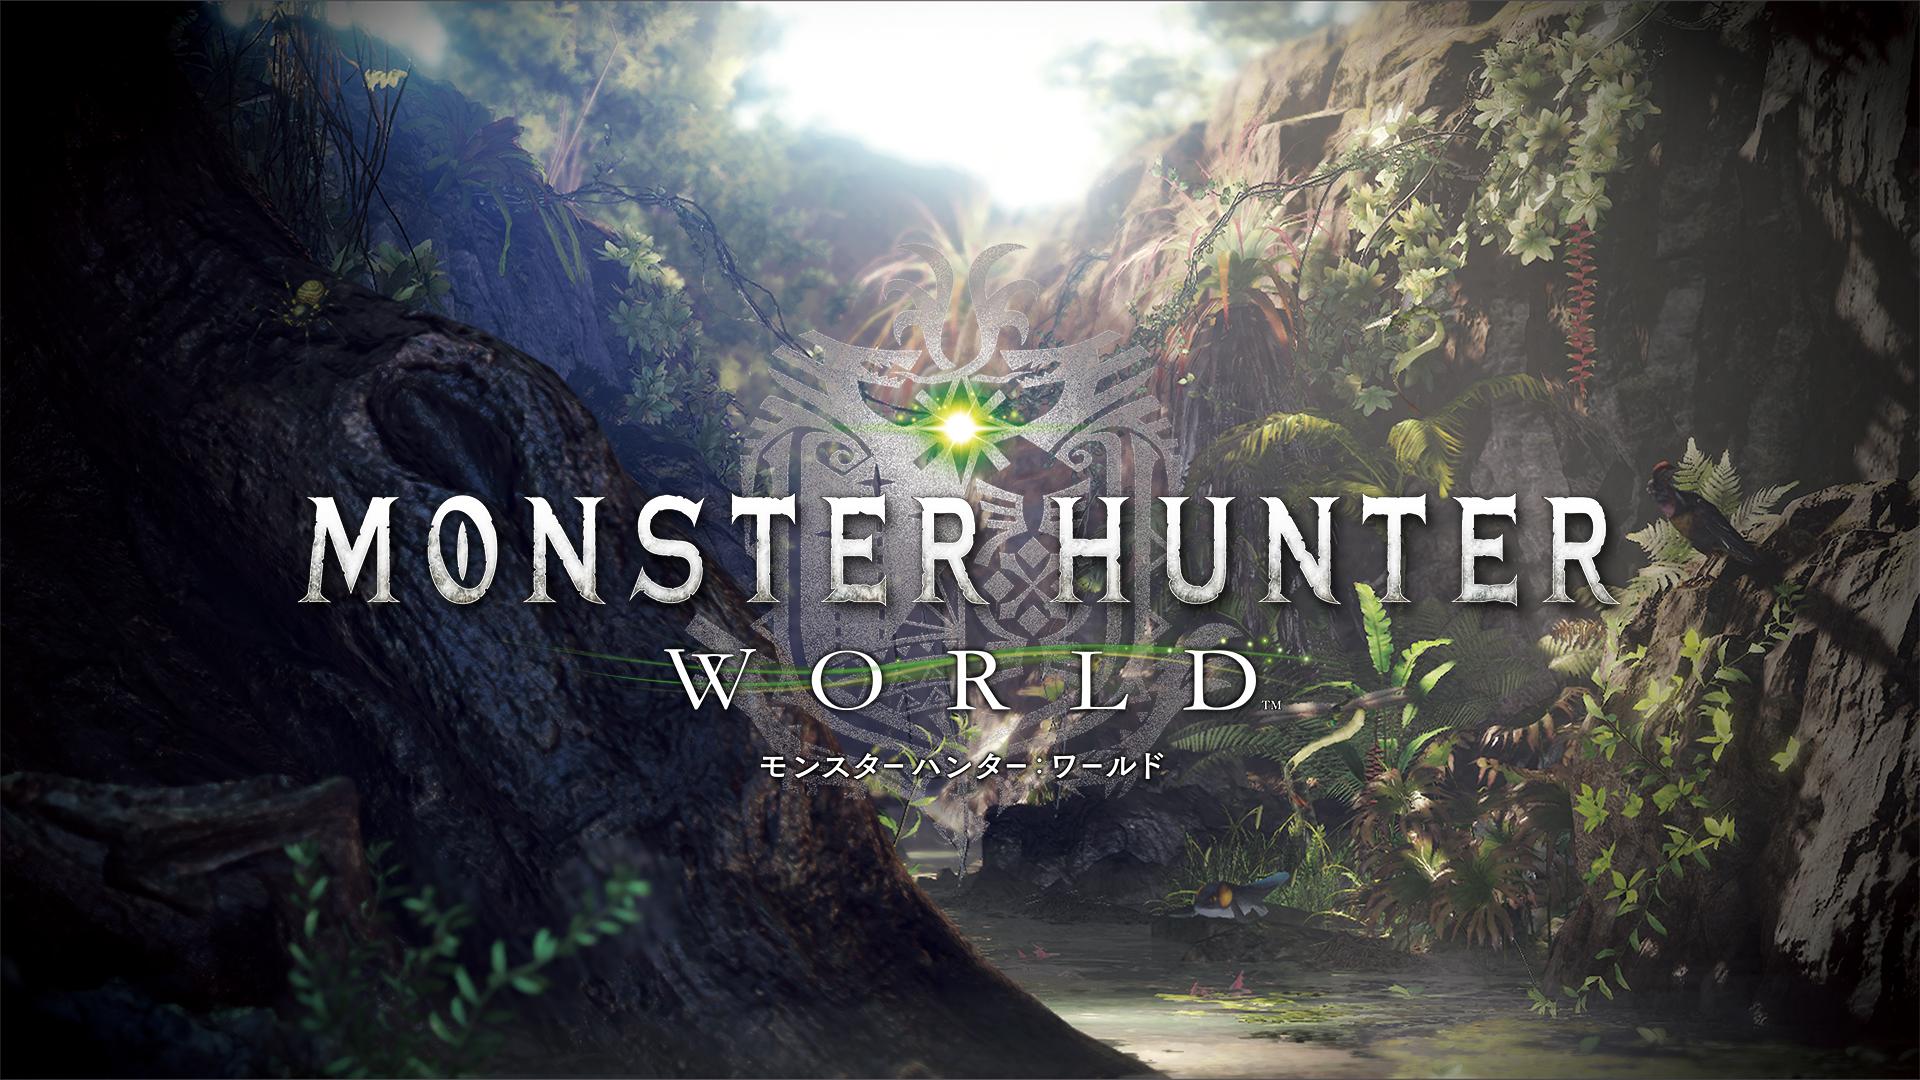 MONSTER HUNTER: WORLD(モンスターハンターワールド) ©CAPCOM CO., LTD. ALL RIGHTS RESERVED.